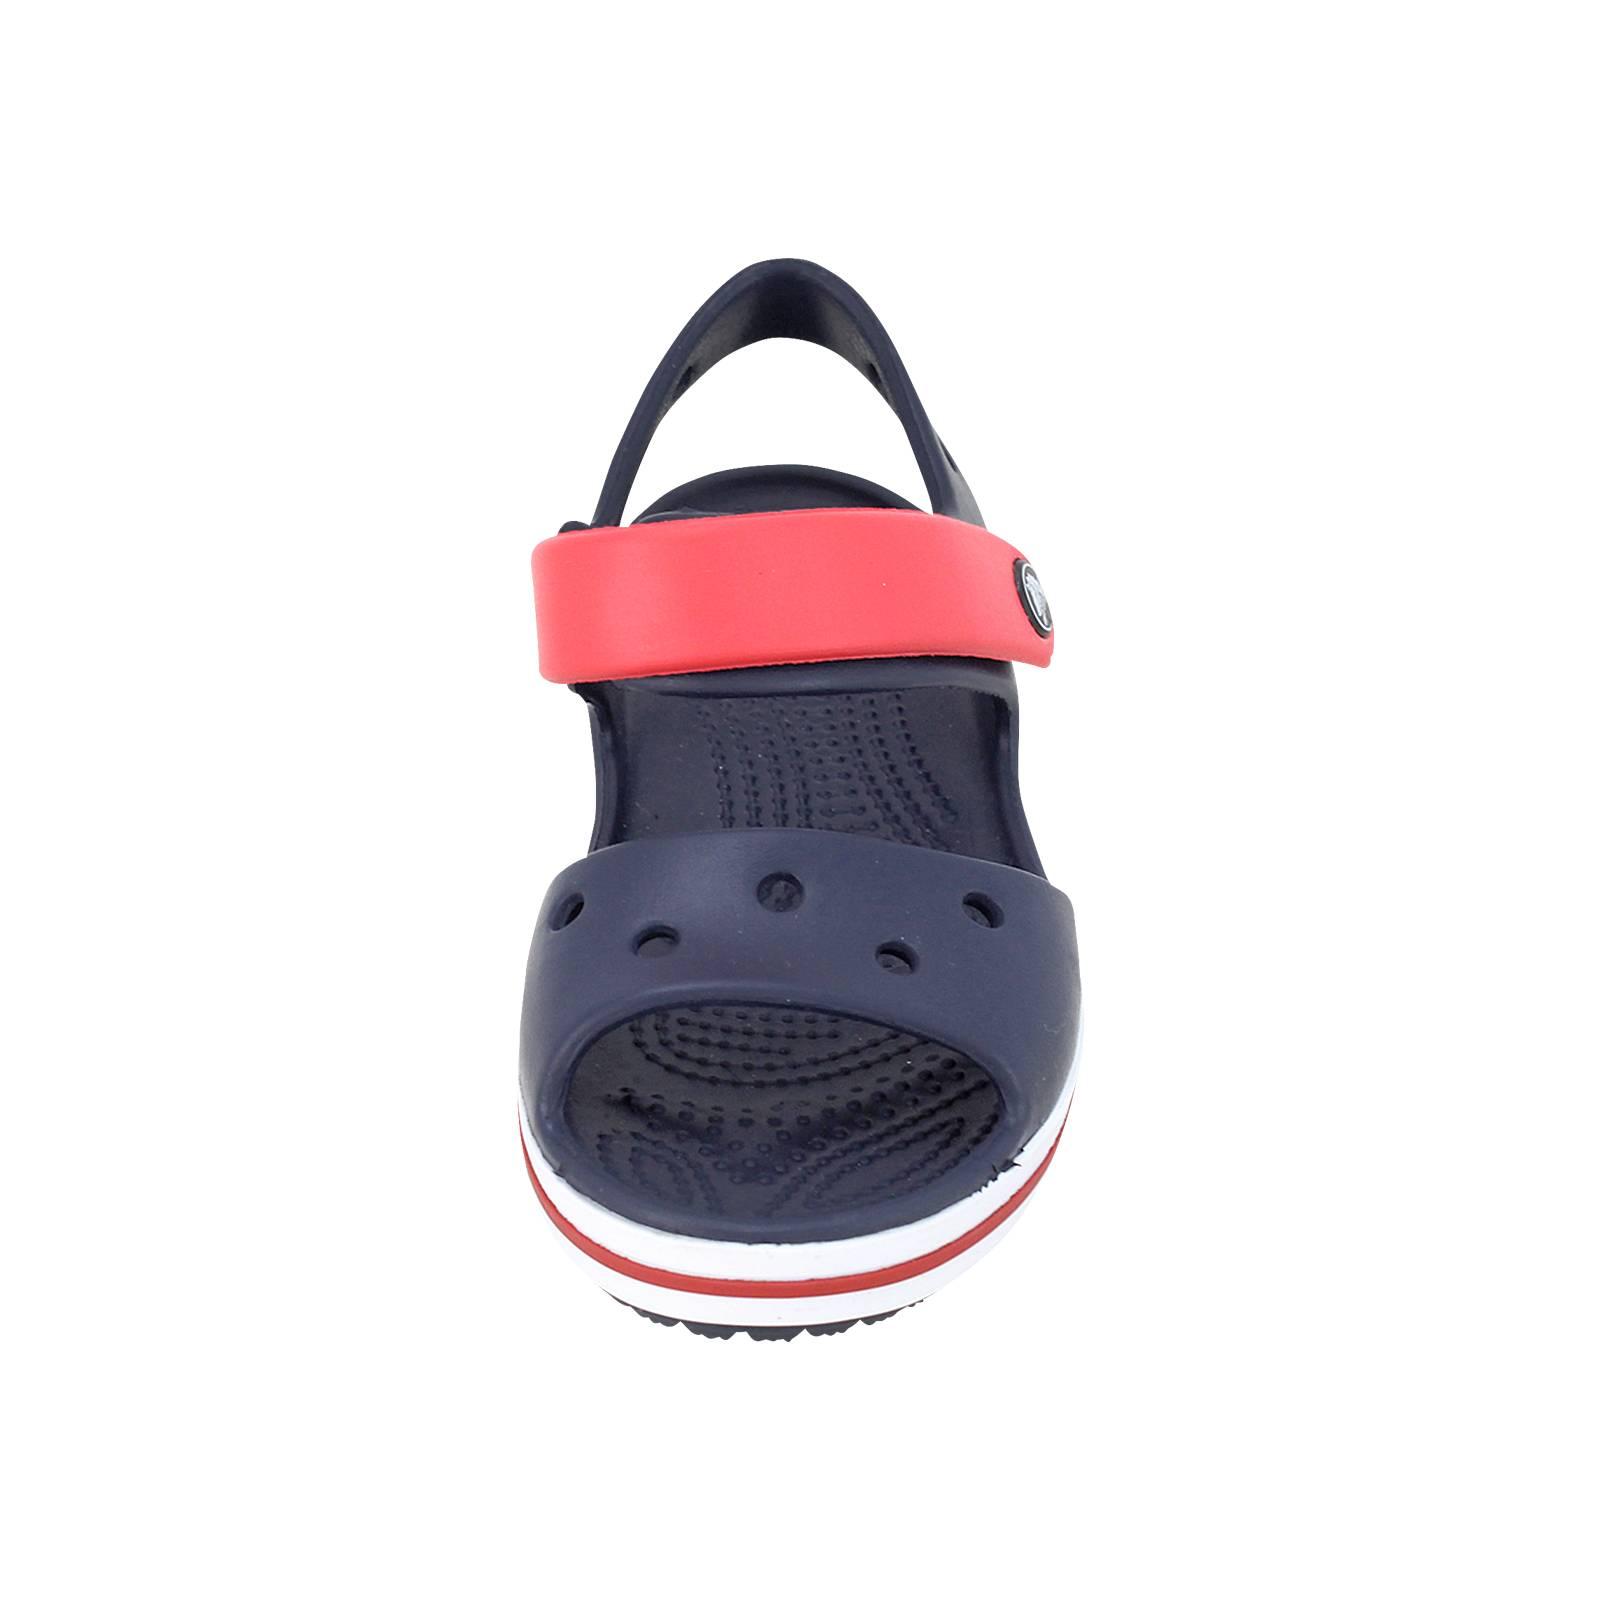 412475c40342 Crocband Sandal S - Crocs Kids  sandals made of croslite - Gianna ...